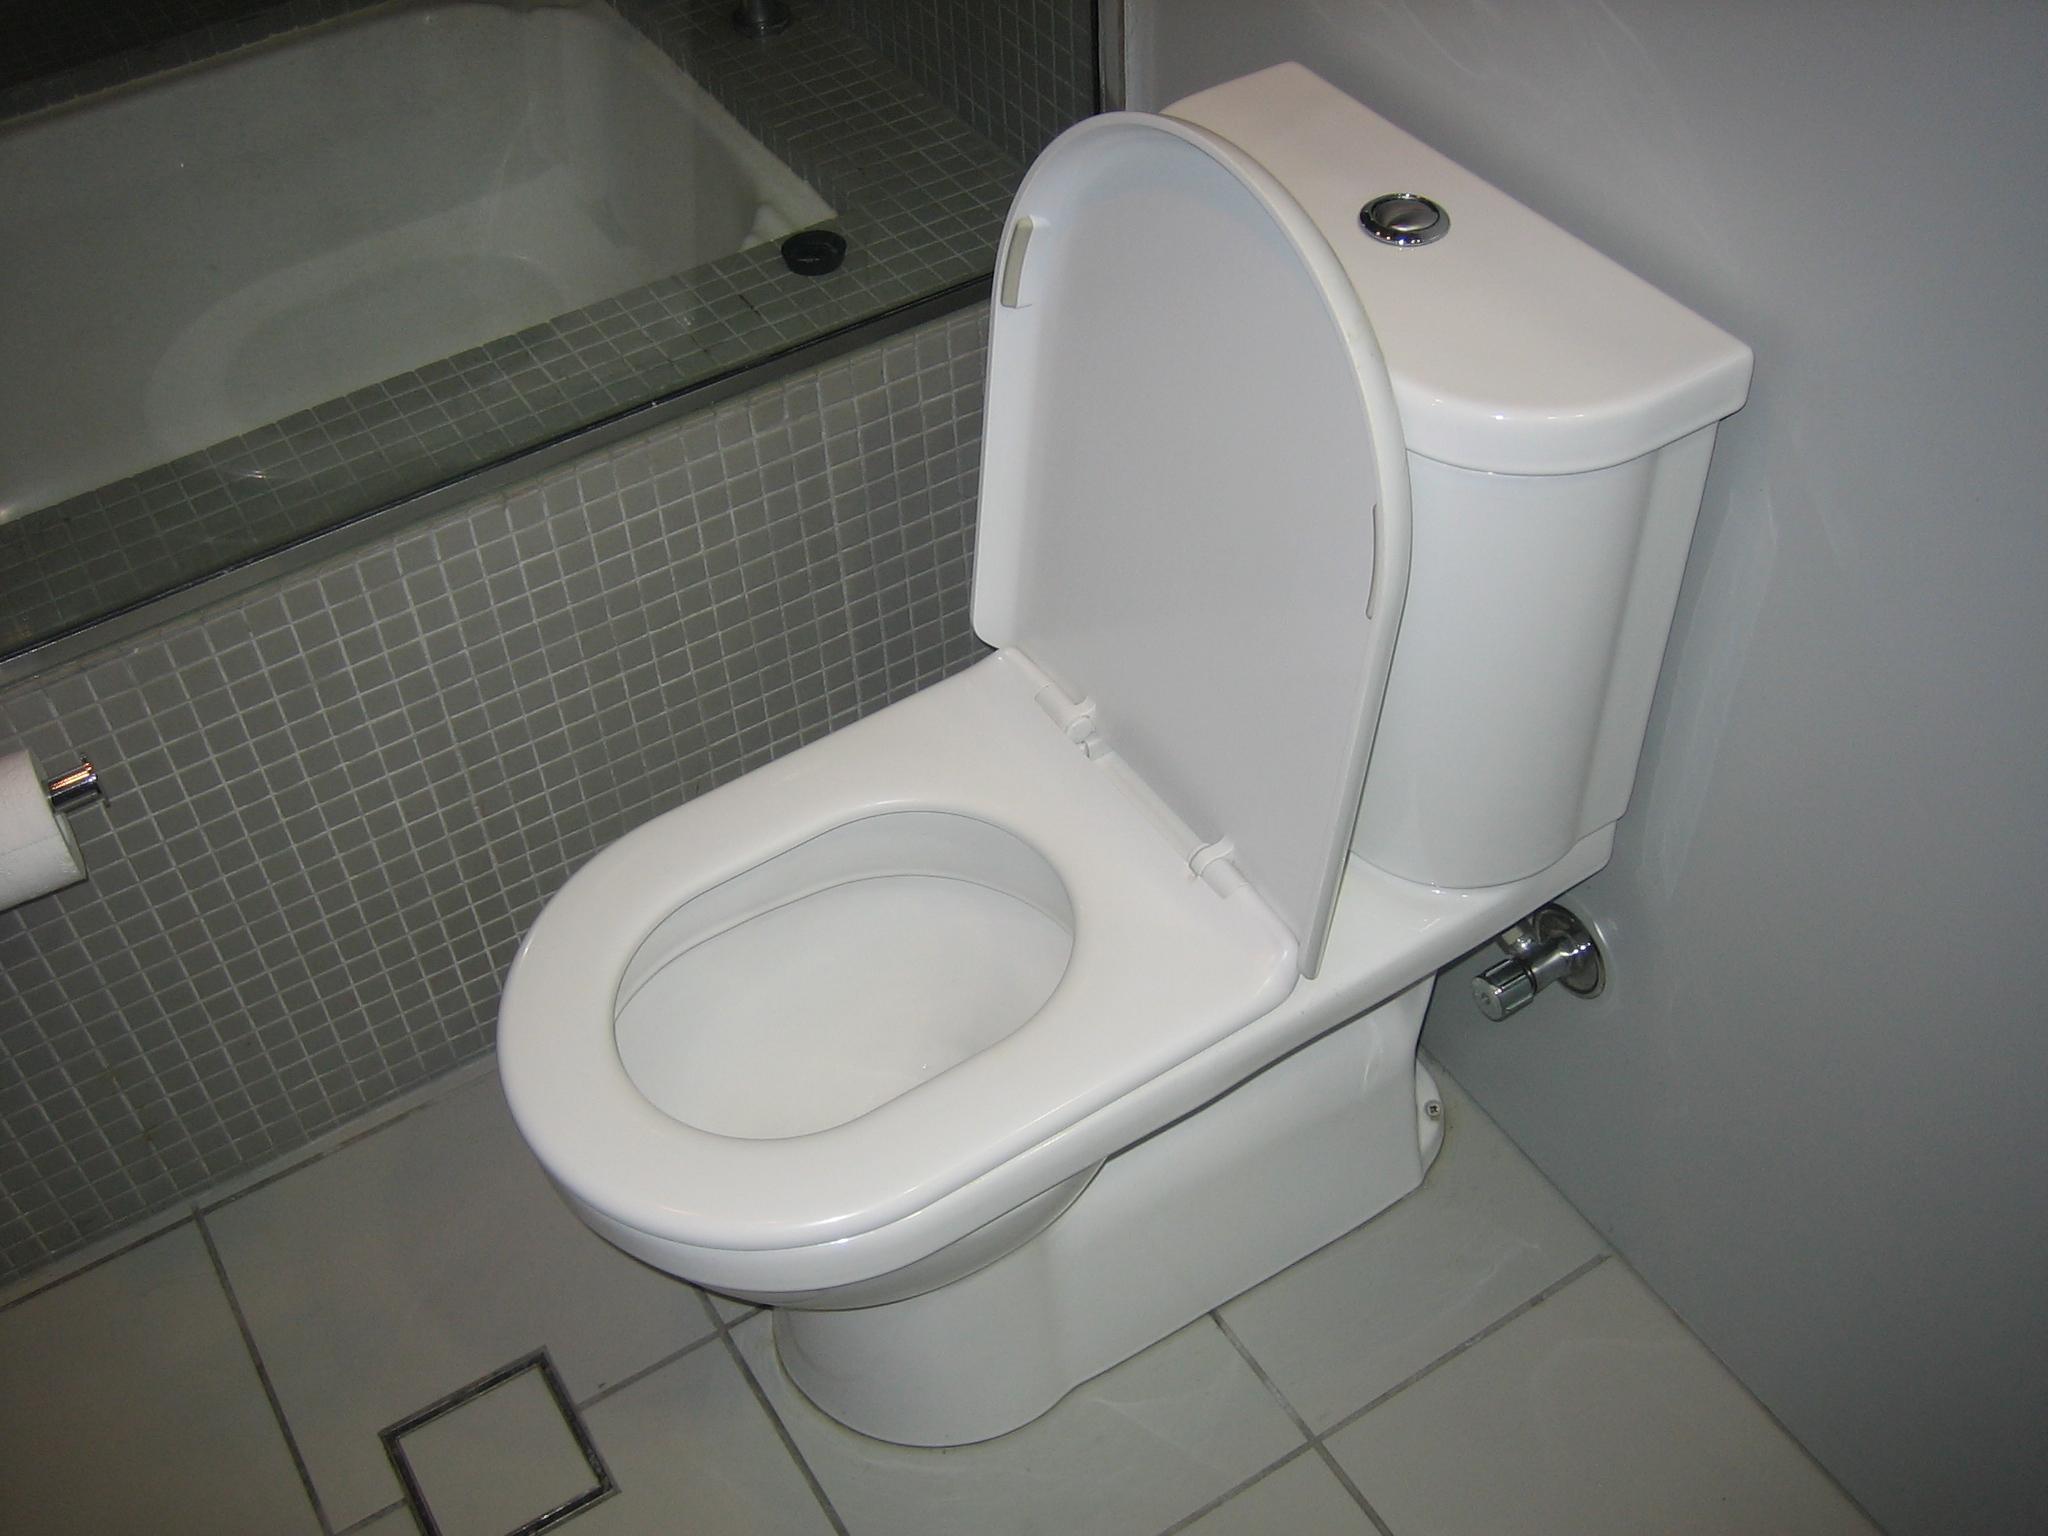 Flush Ilet